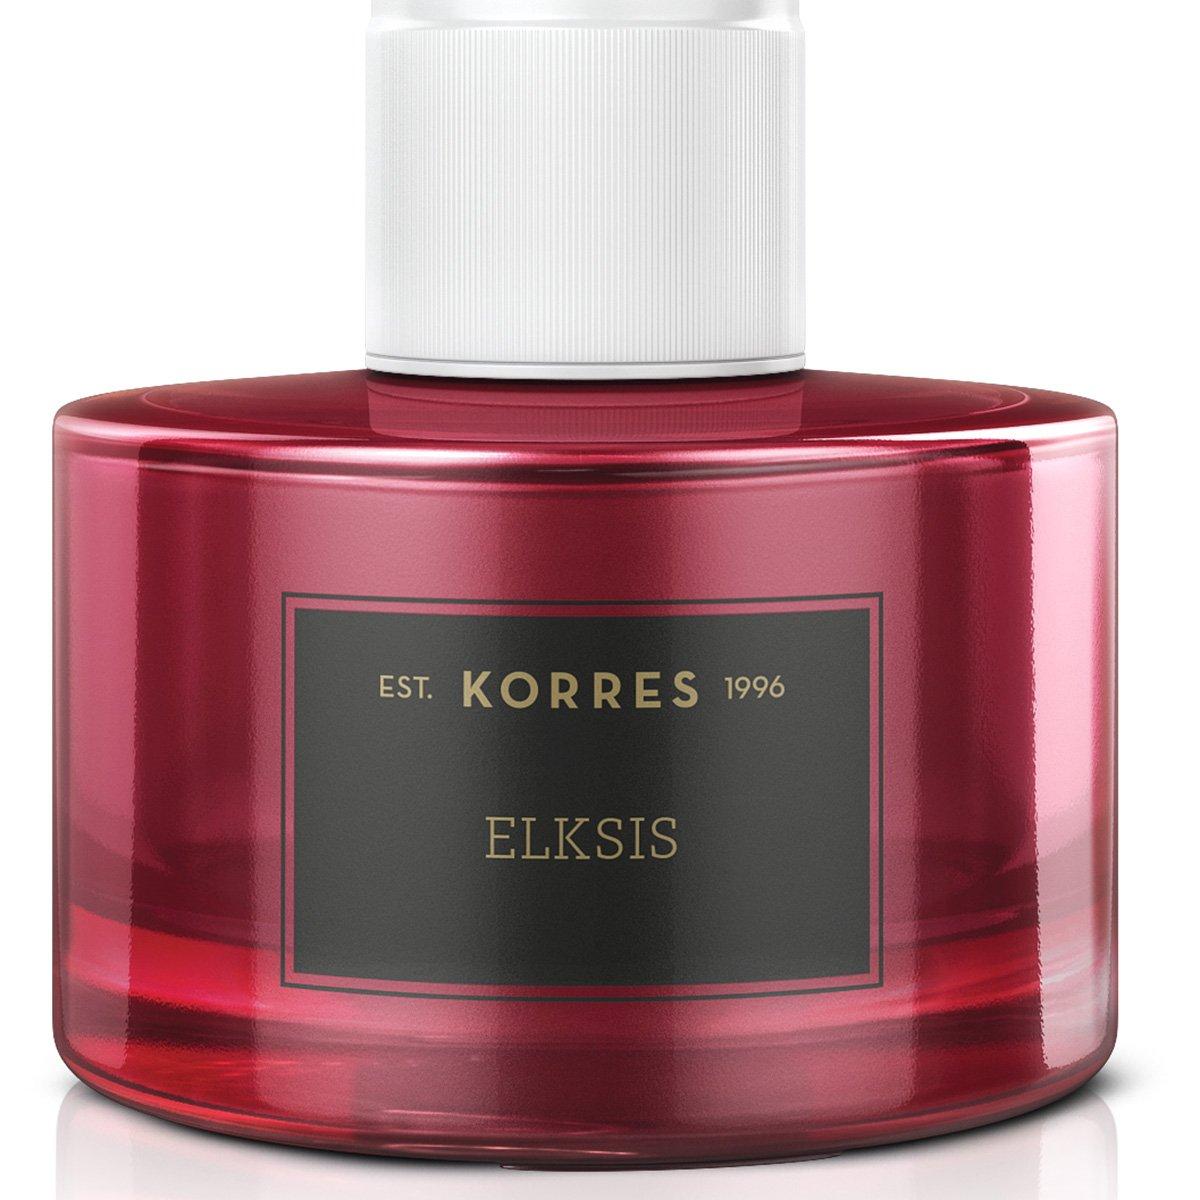 775c99600 Perfume Elksis Korres Feminino Eau de Parfum 75ml